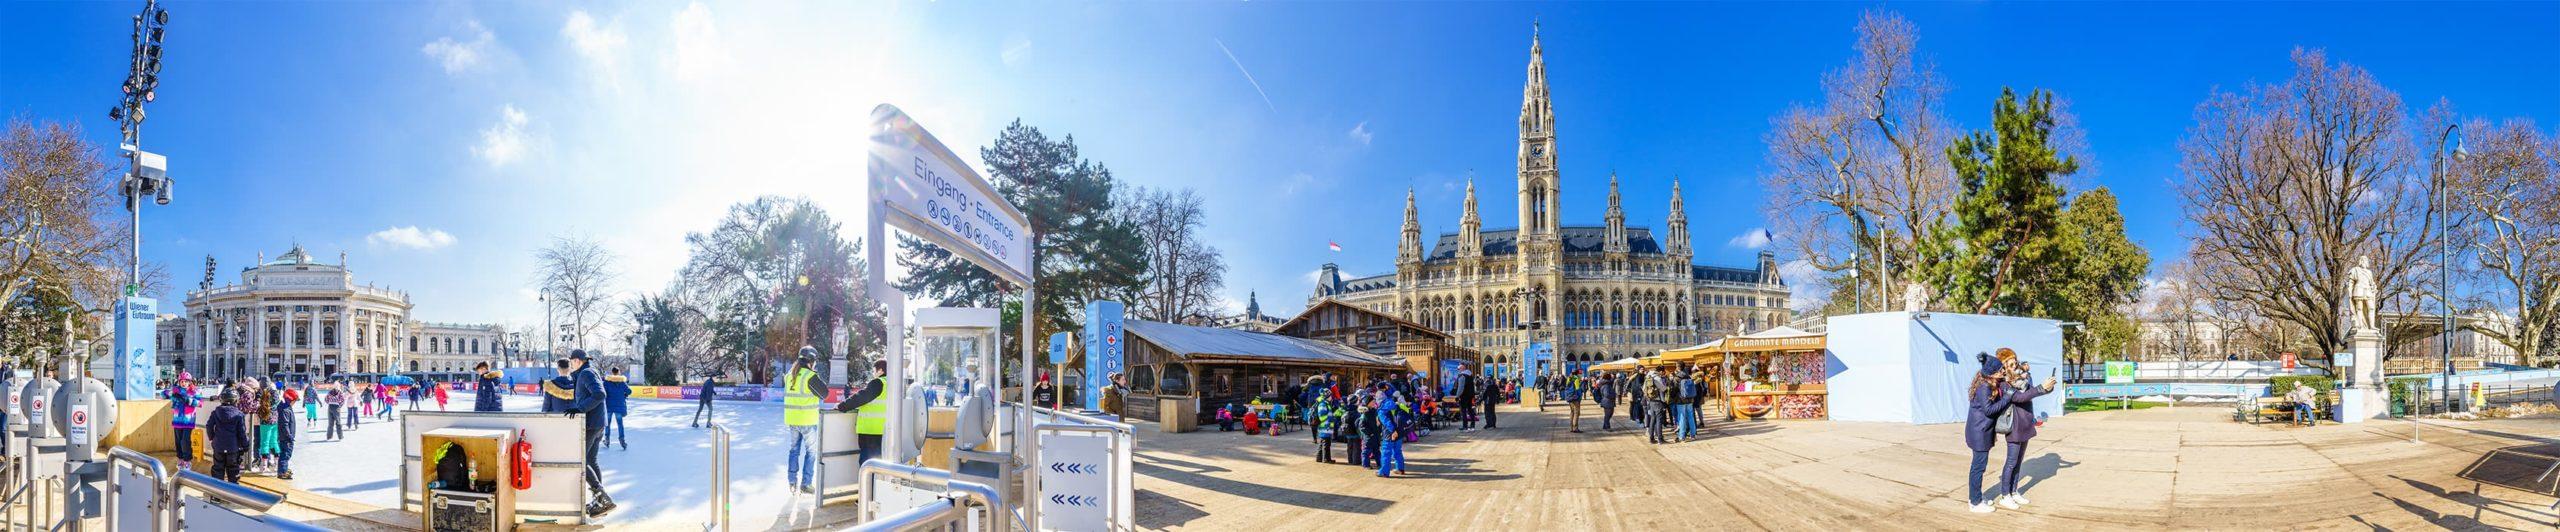 wien-panorama-rathausplatz